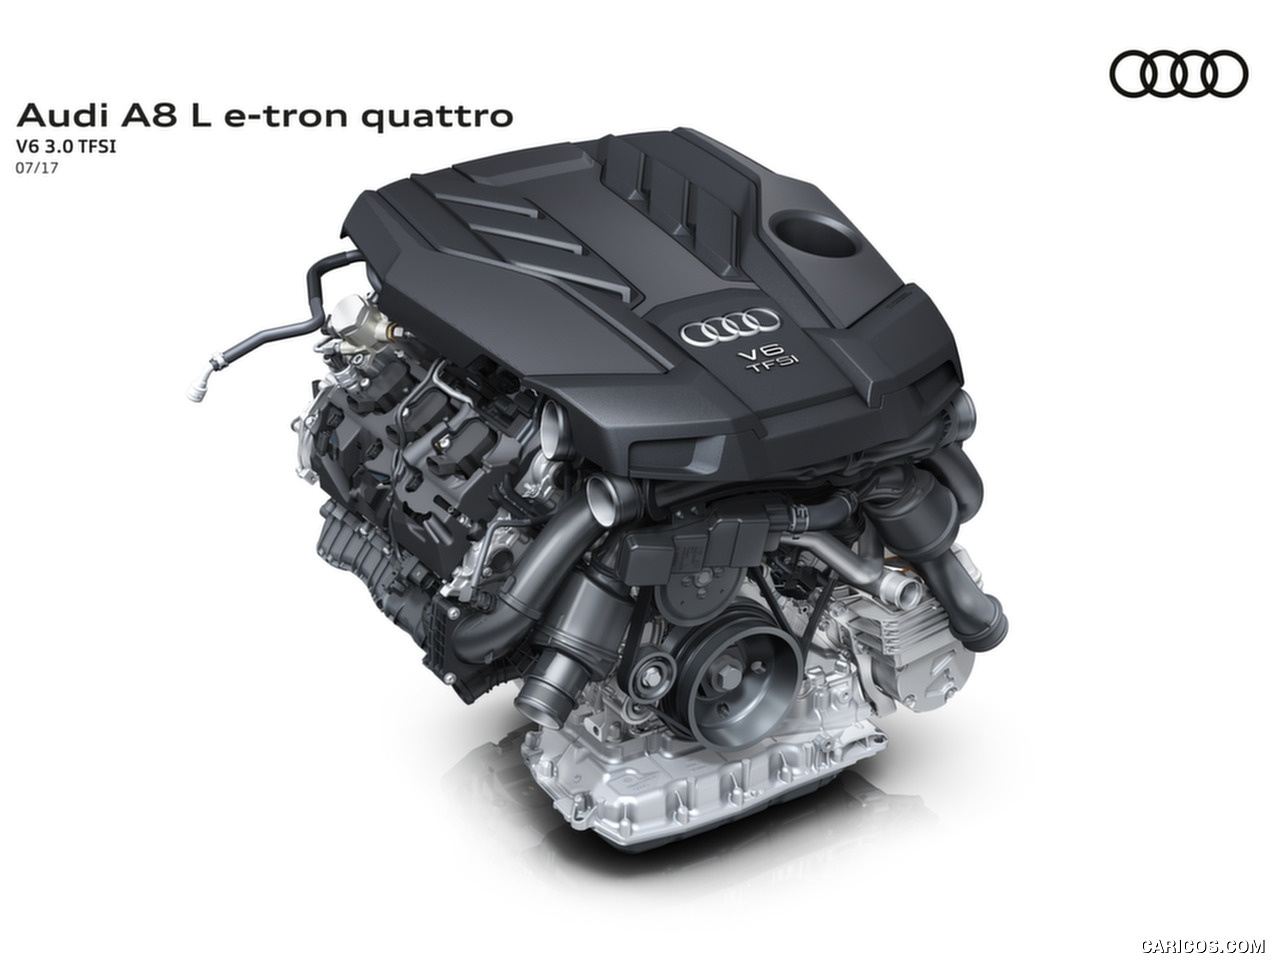 2018 Audi A8 L e tron   V6 30 TFSI Engine HD Wallpaper 53 1280x960